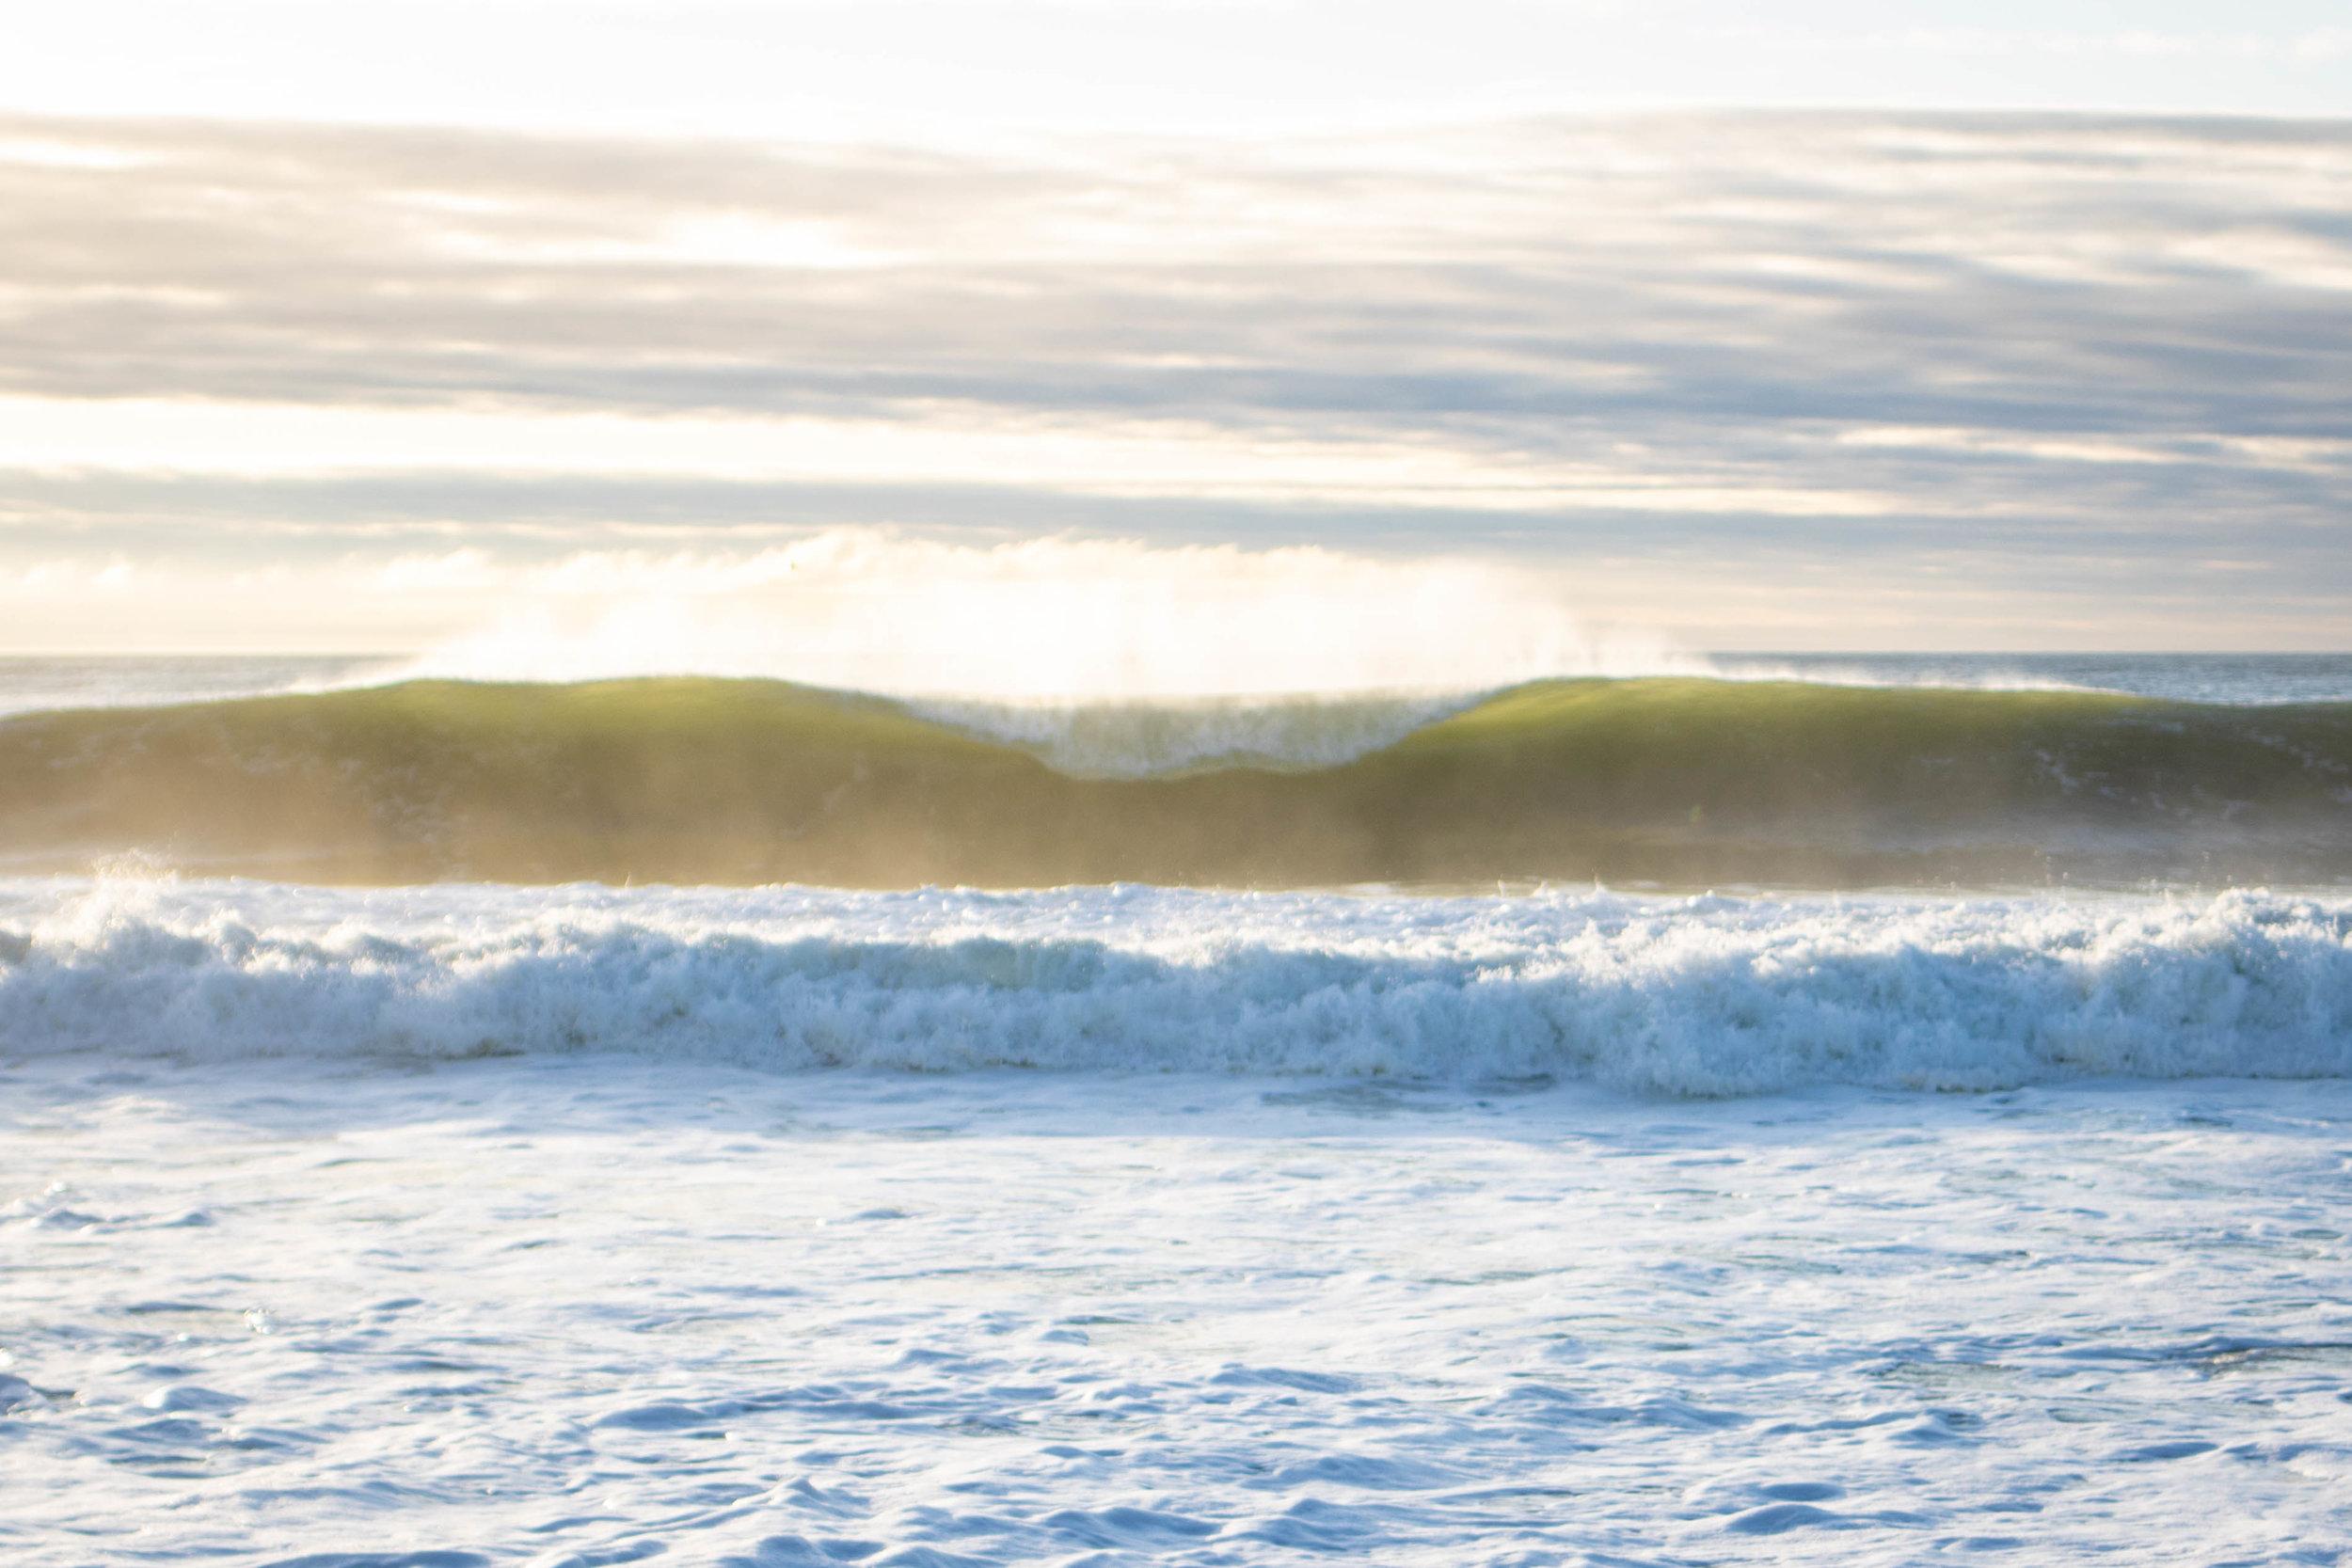 4-26-18 Mantoloking Wave 8.jpg